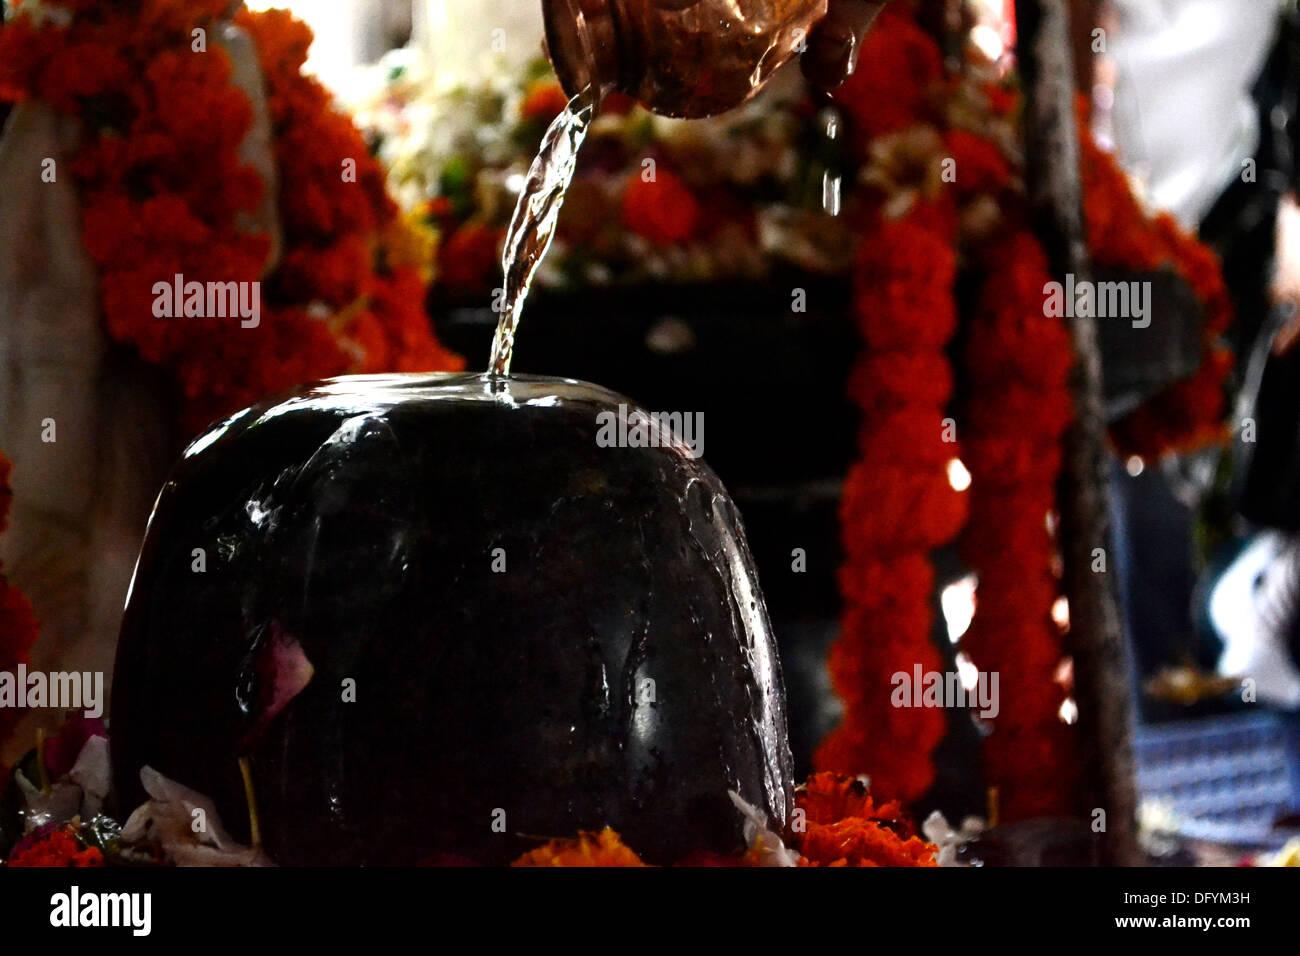 Indian temple, Mahadev, Lord Shiva Temple - Stock Image